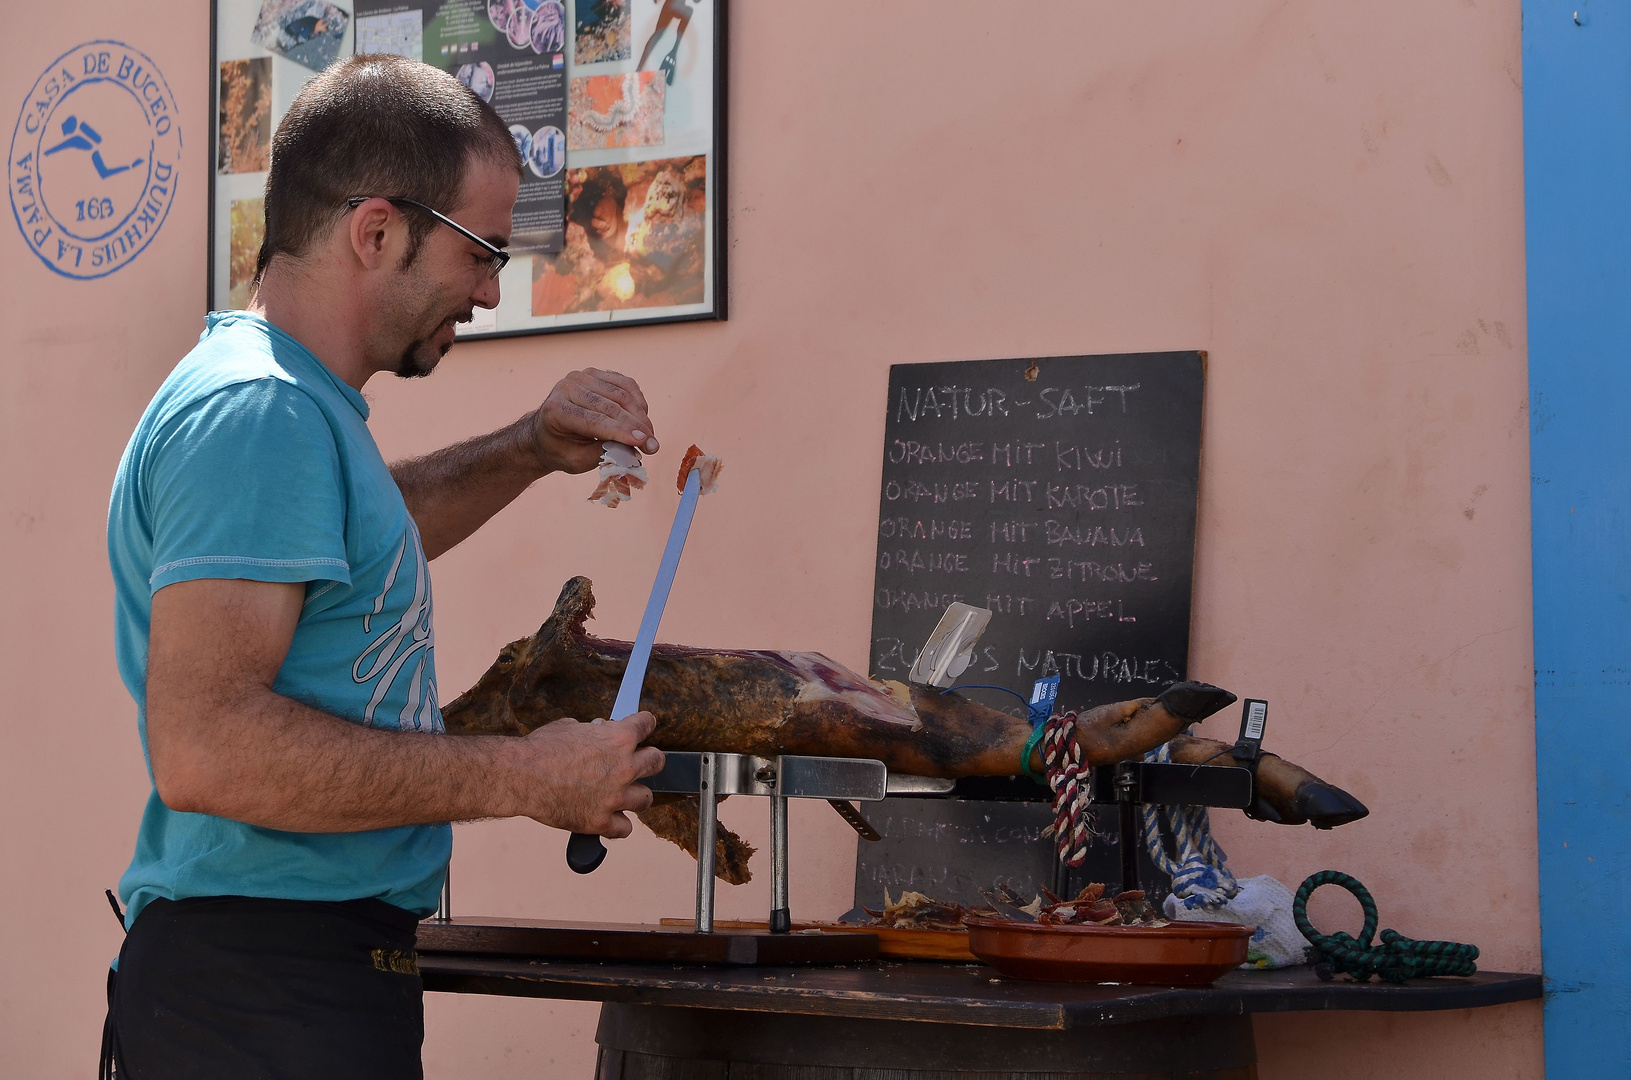 Maestro del jamón, Los Llanos de Aridane, September 2013